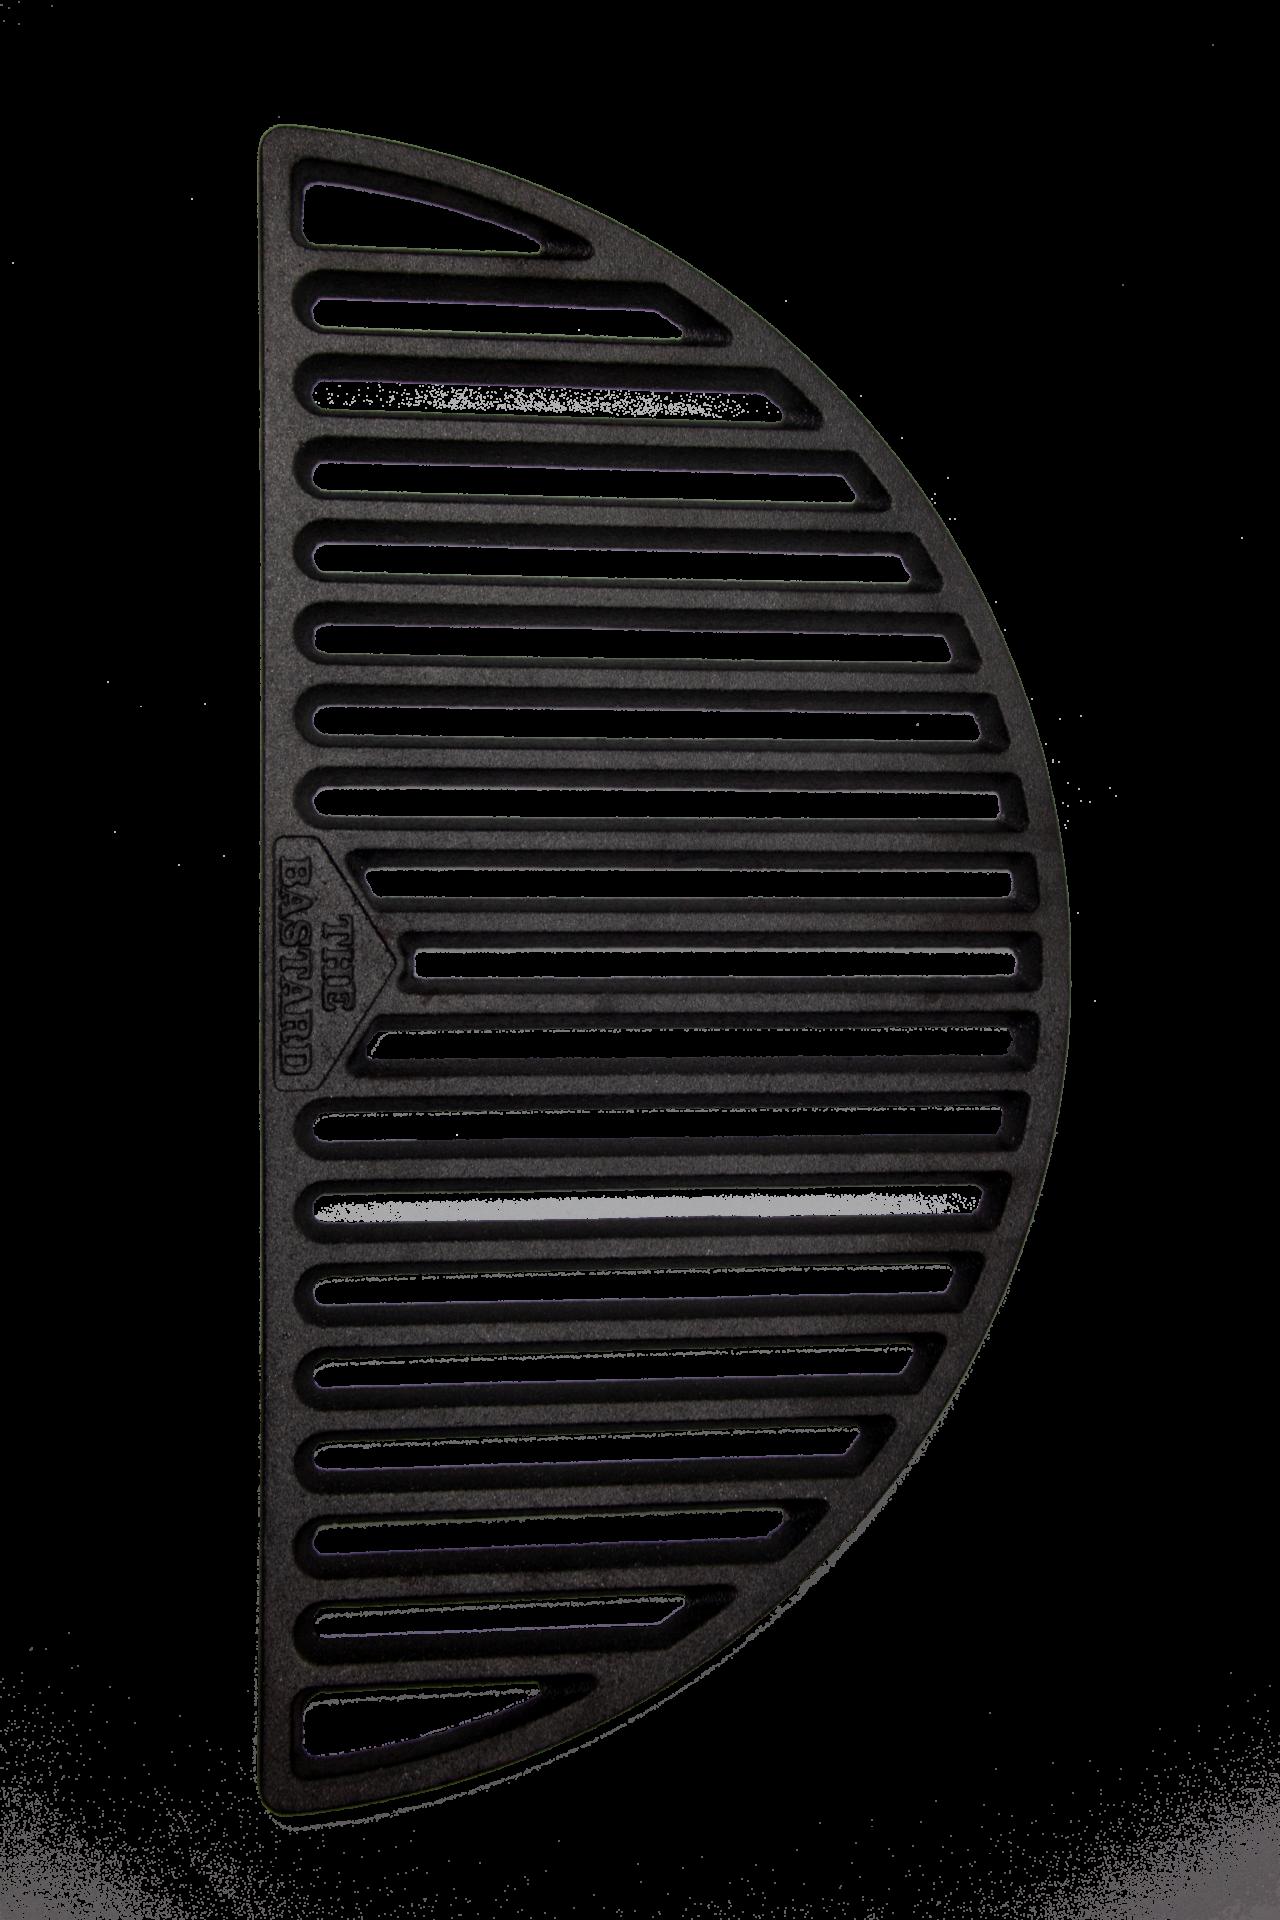 The bastard half moon grid